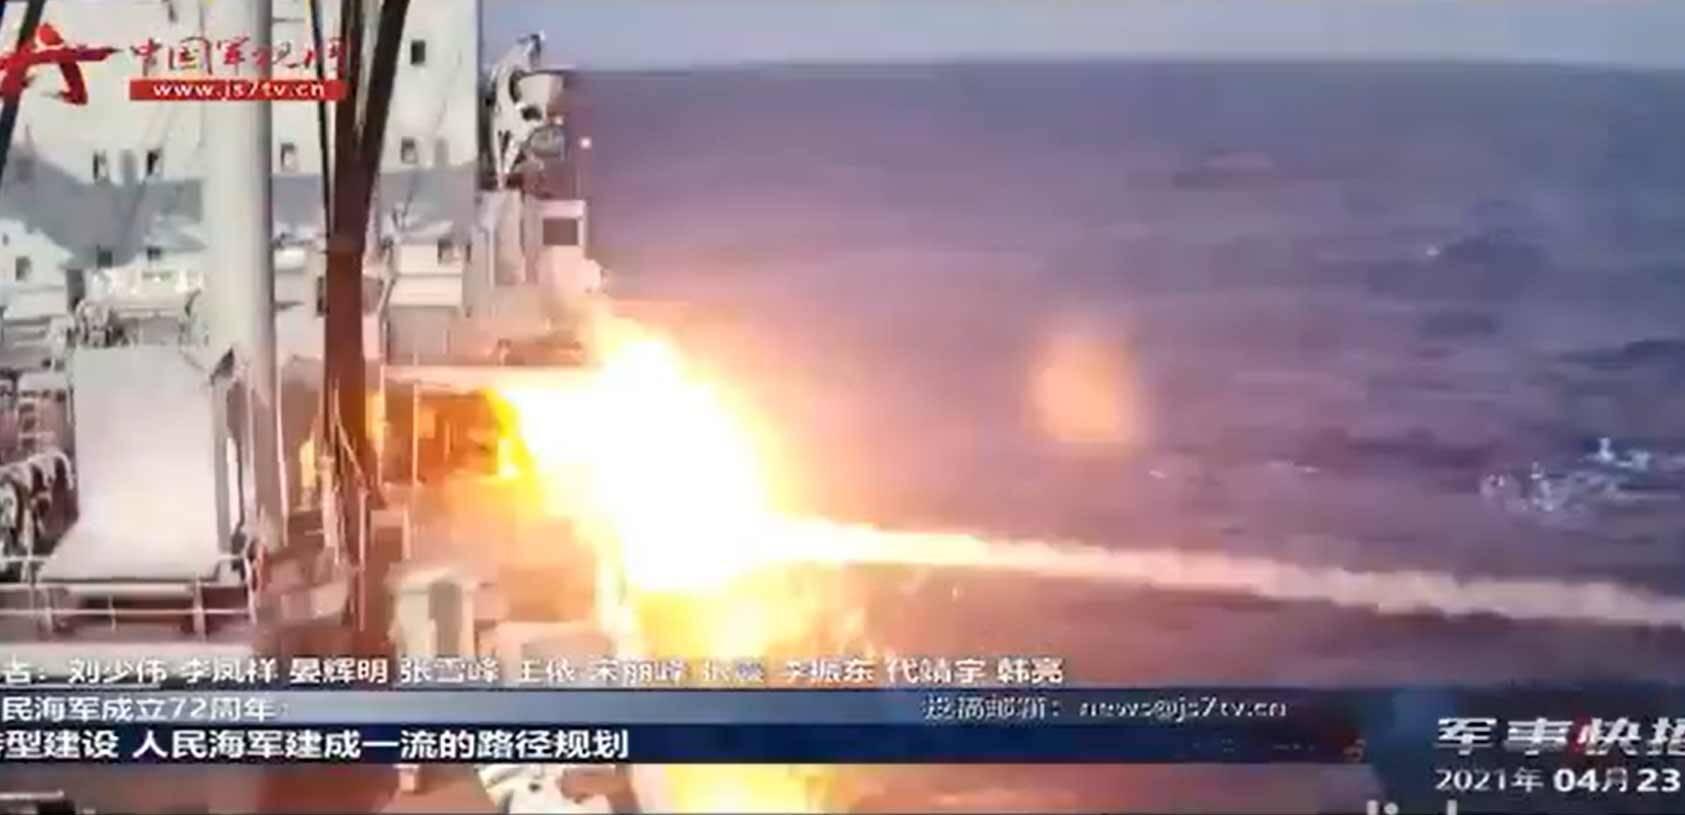 Vídeo mostra míssil supersônico chinês atingindo navio . Foto: reprodução Twitter